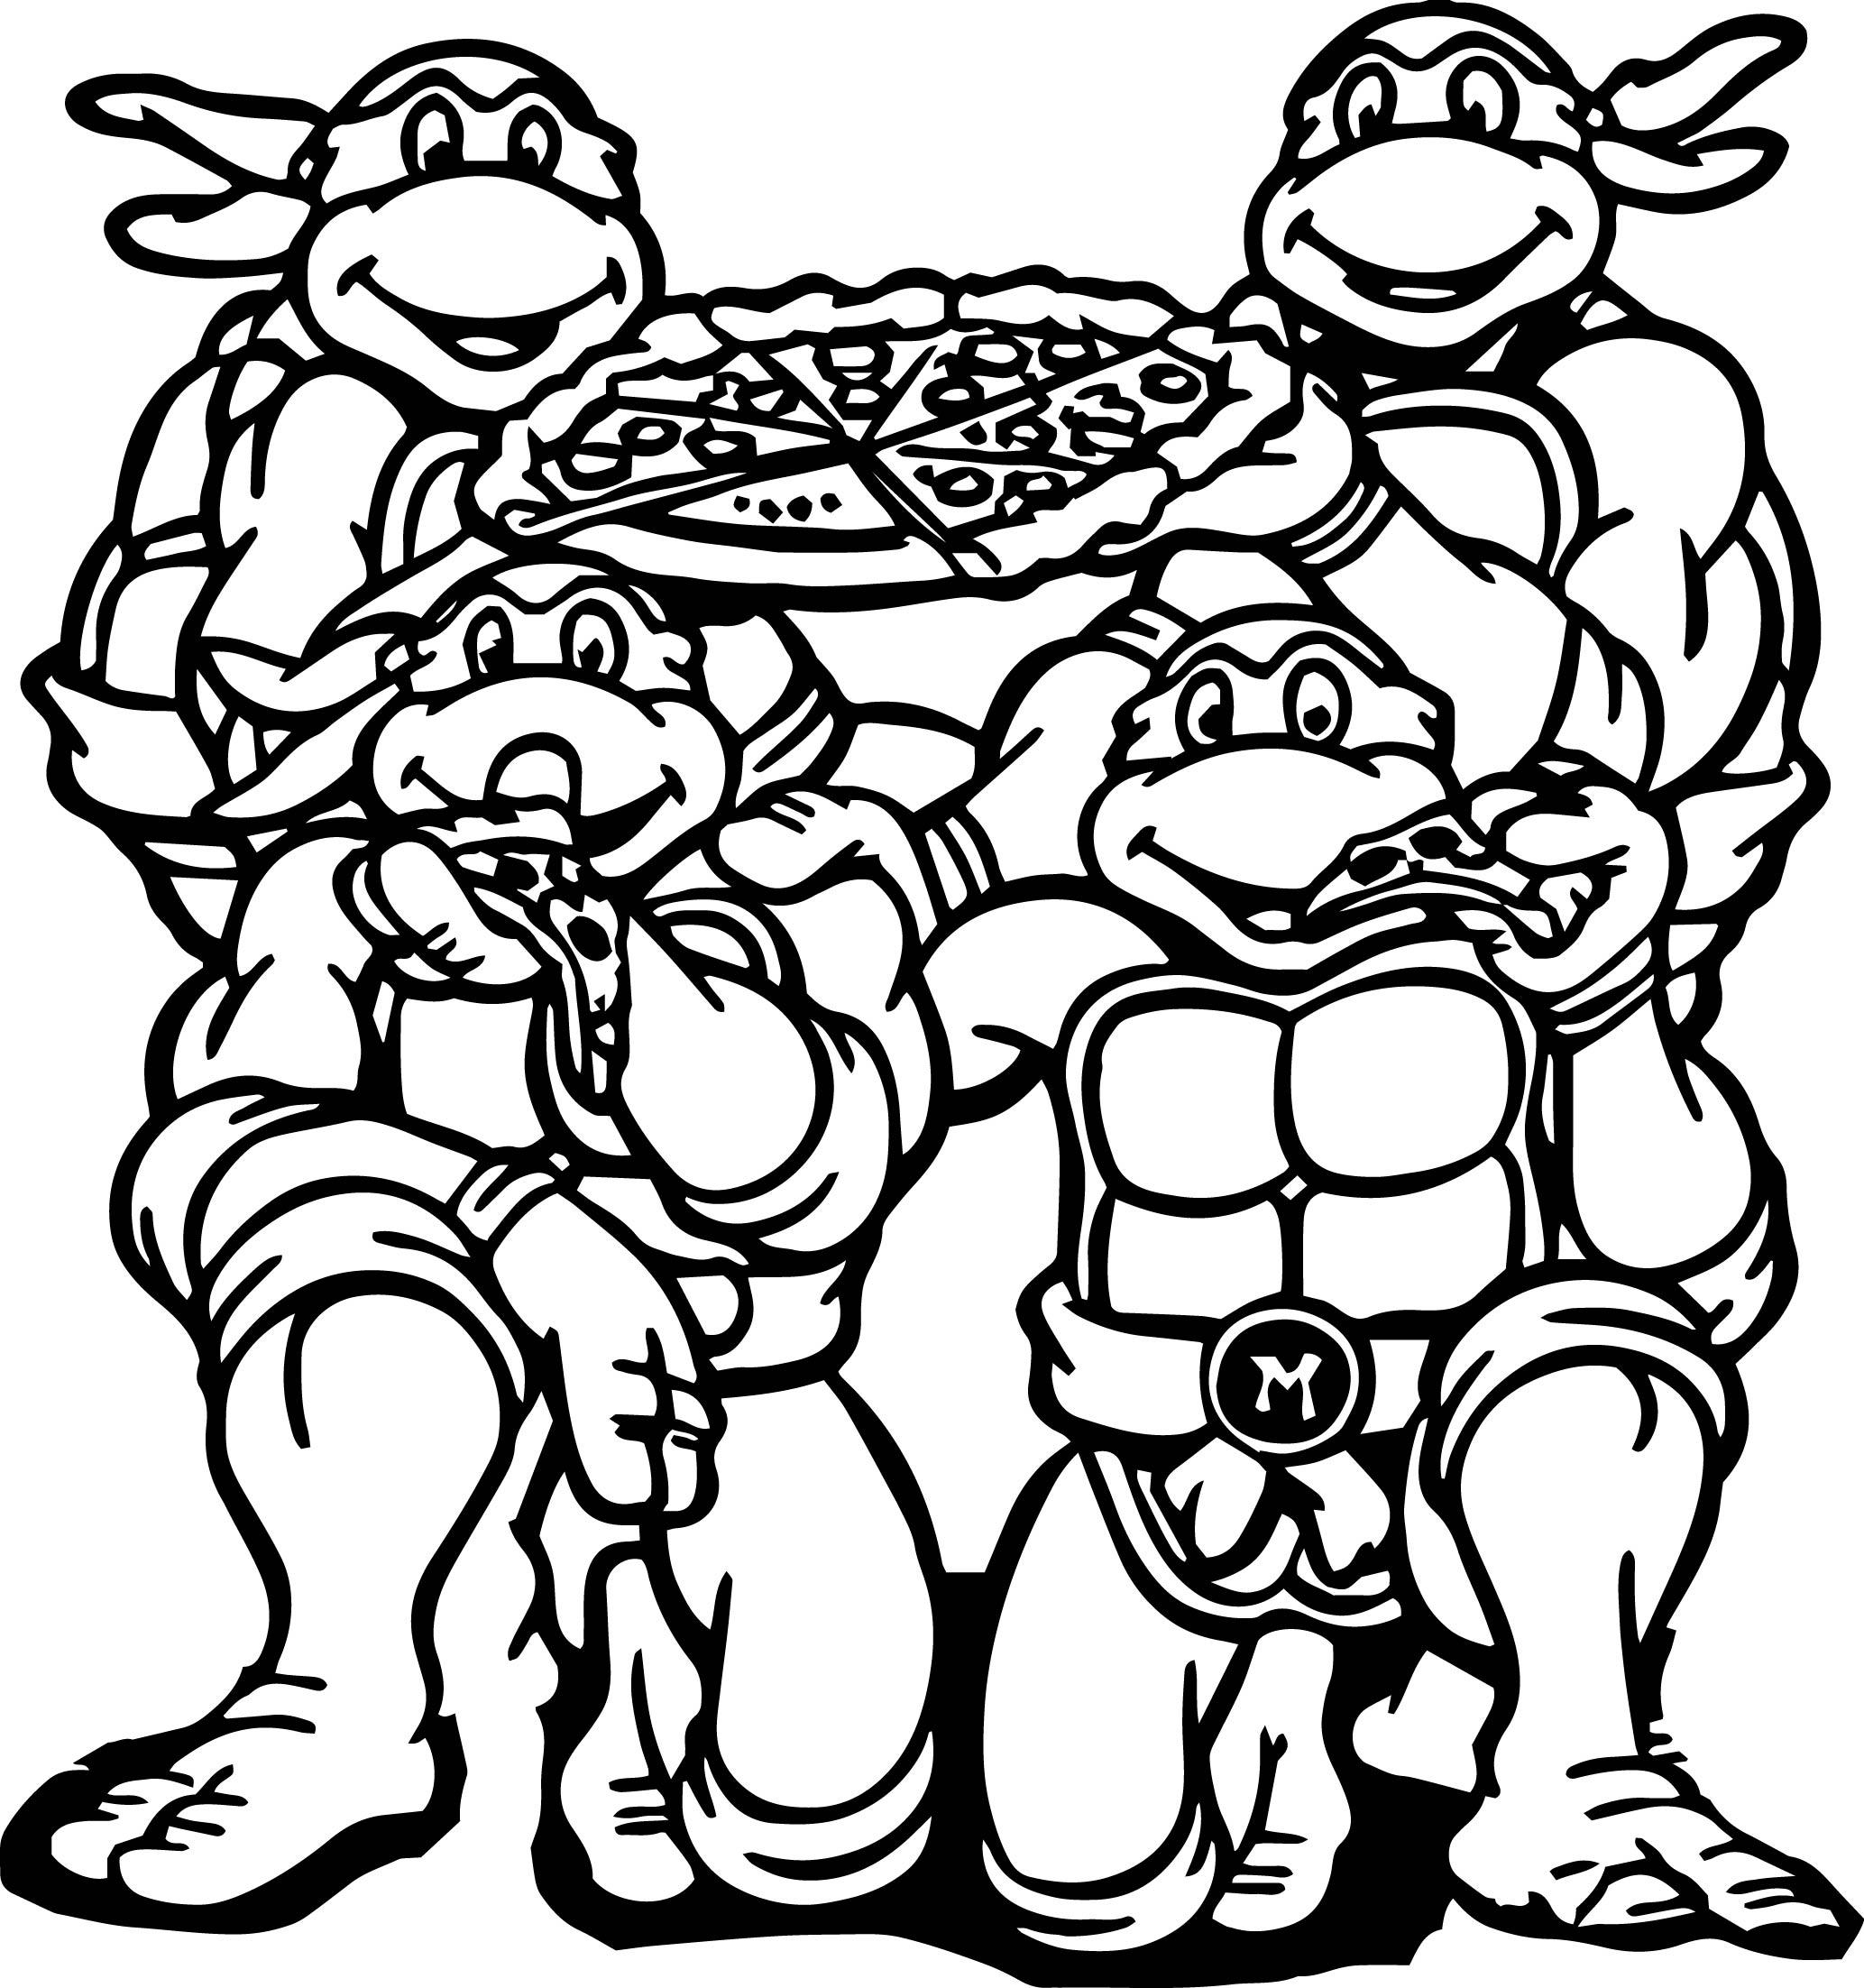 Ninja Turtles Coloring Pages Raphael At Getcolorings